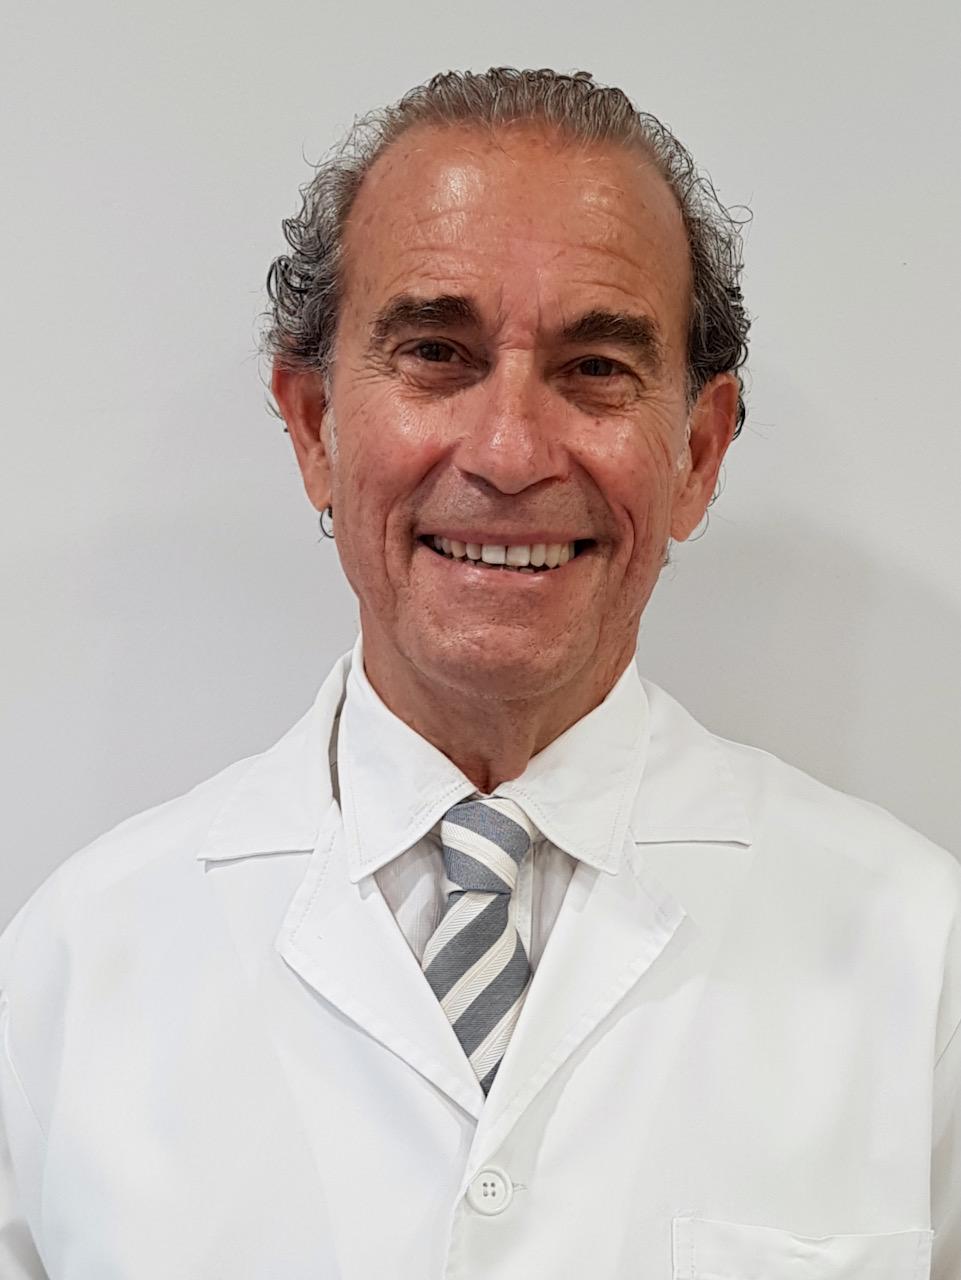 Dr. Jordi Tomás Mauri